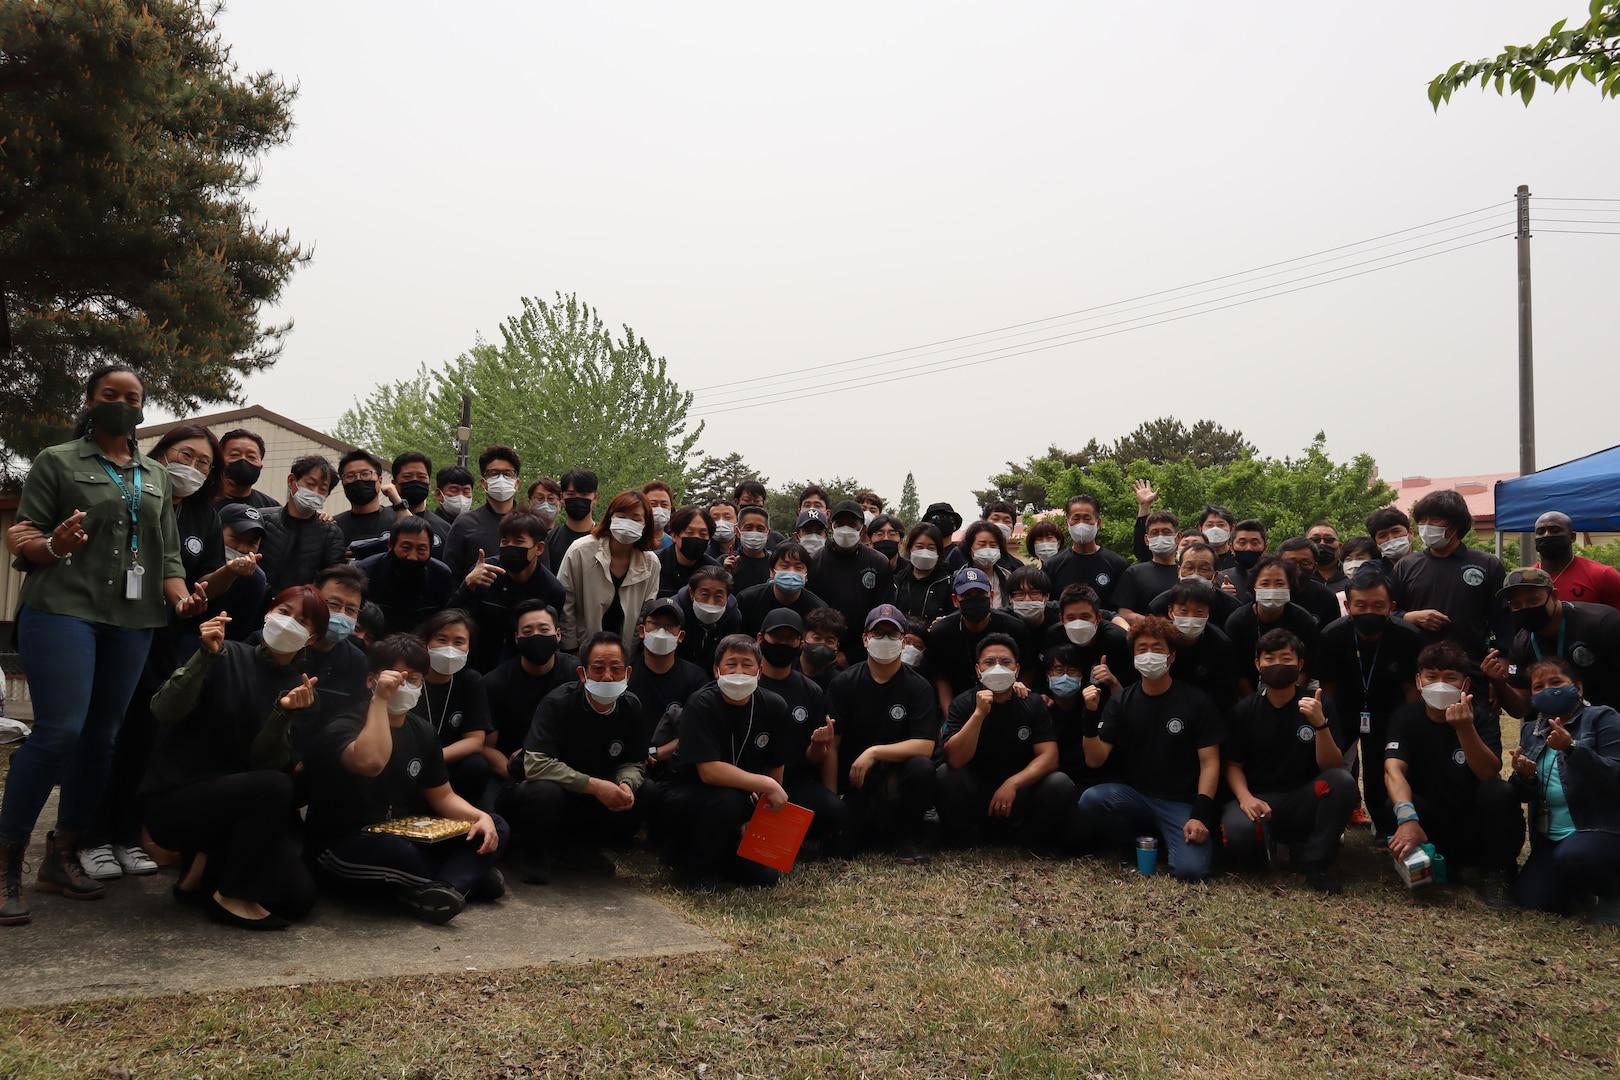 DLA Distribution Korea walks, hikes, bikes 1,151 miles for DLA Teal Ribbon Relay